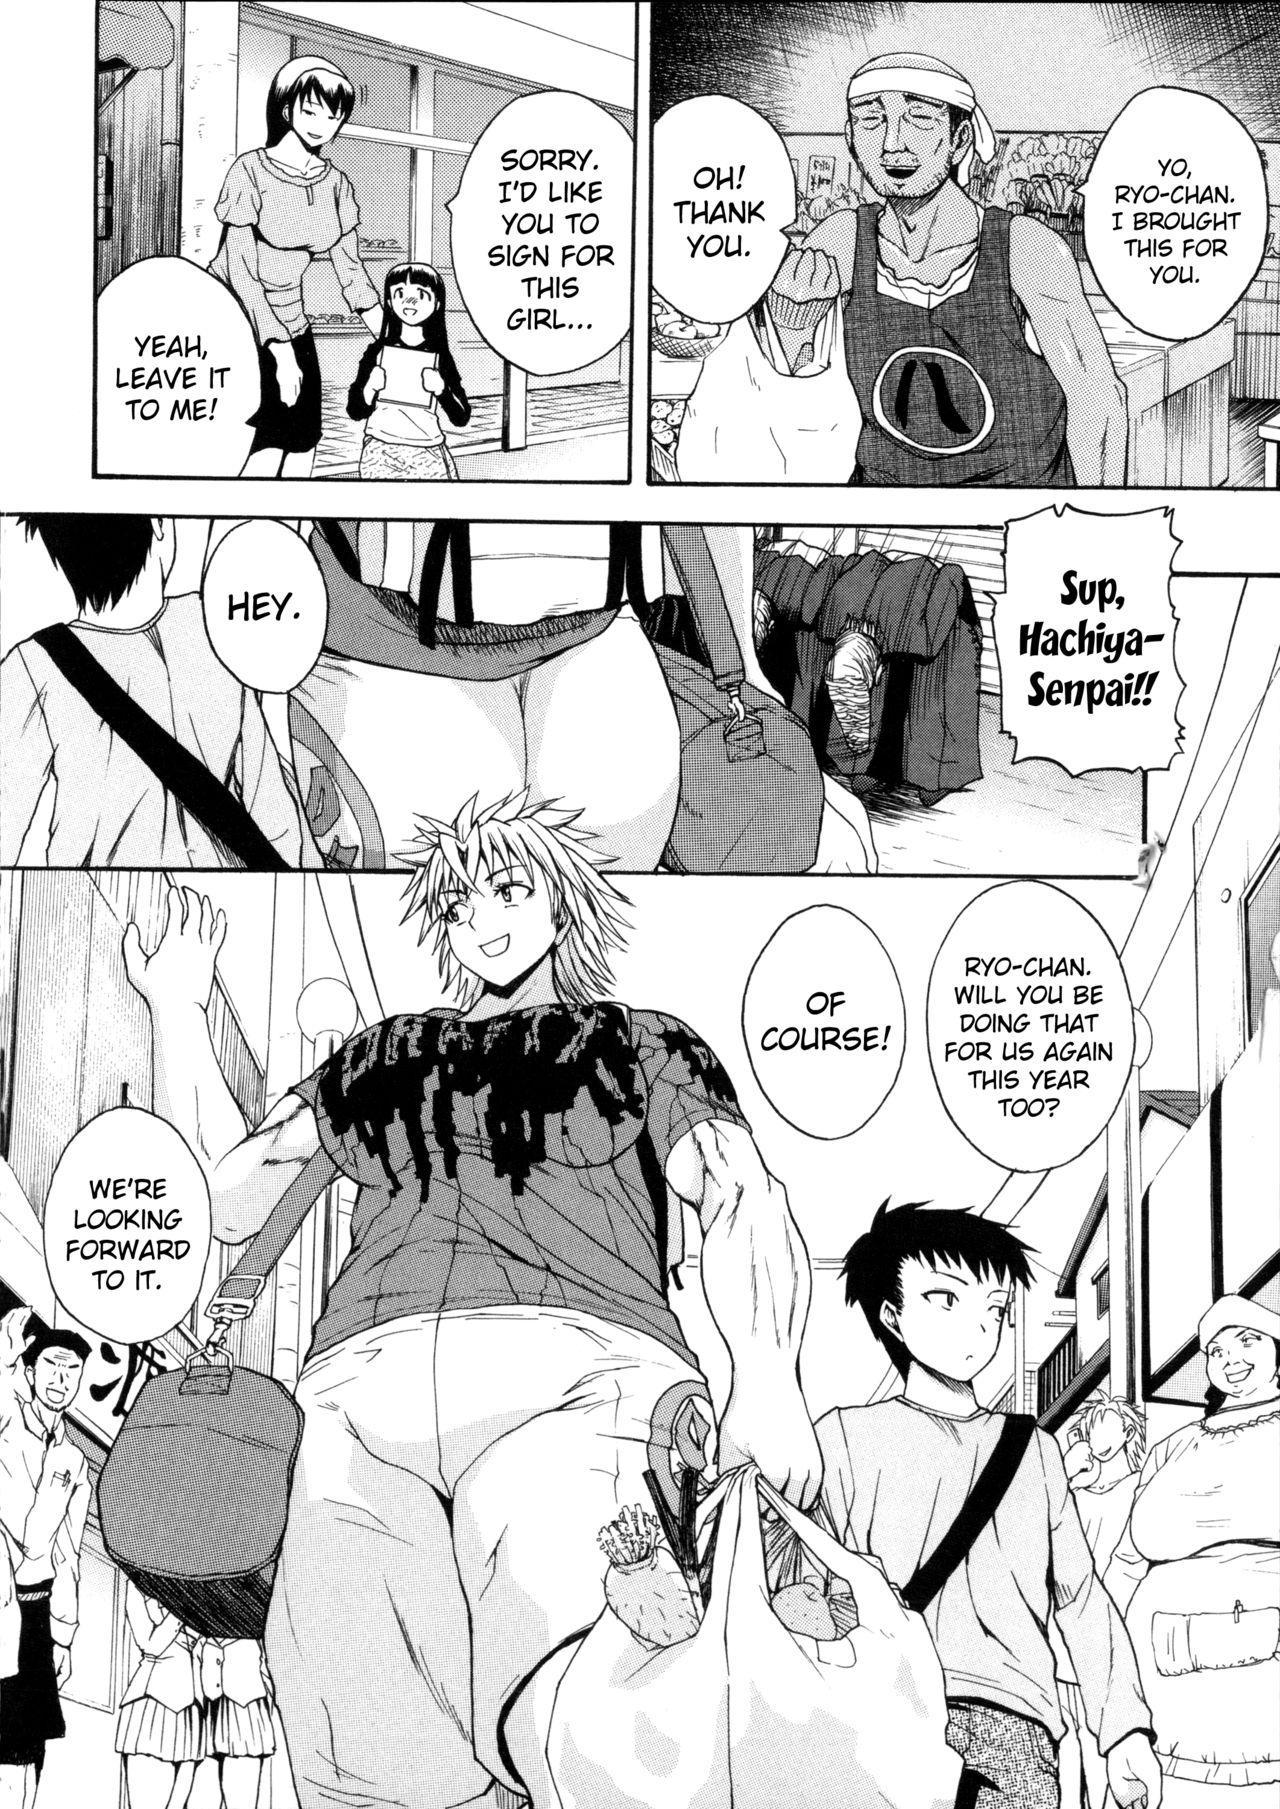 [Yoshimura Tatsumaki] Monzetsu Taigatame ~Count 3 de Ikasete Ageru~ | Faint in Agony Bodylock ~I'll make you cum on the count of 3~ [English] [Brolen] 114